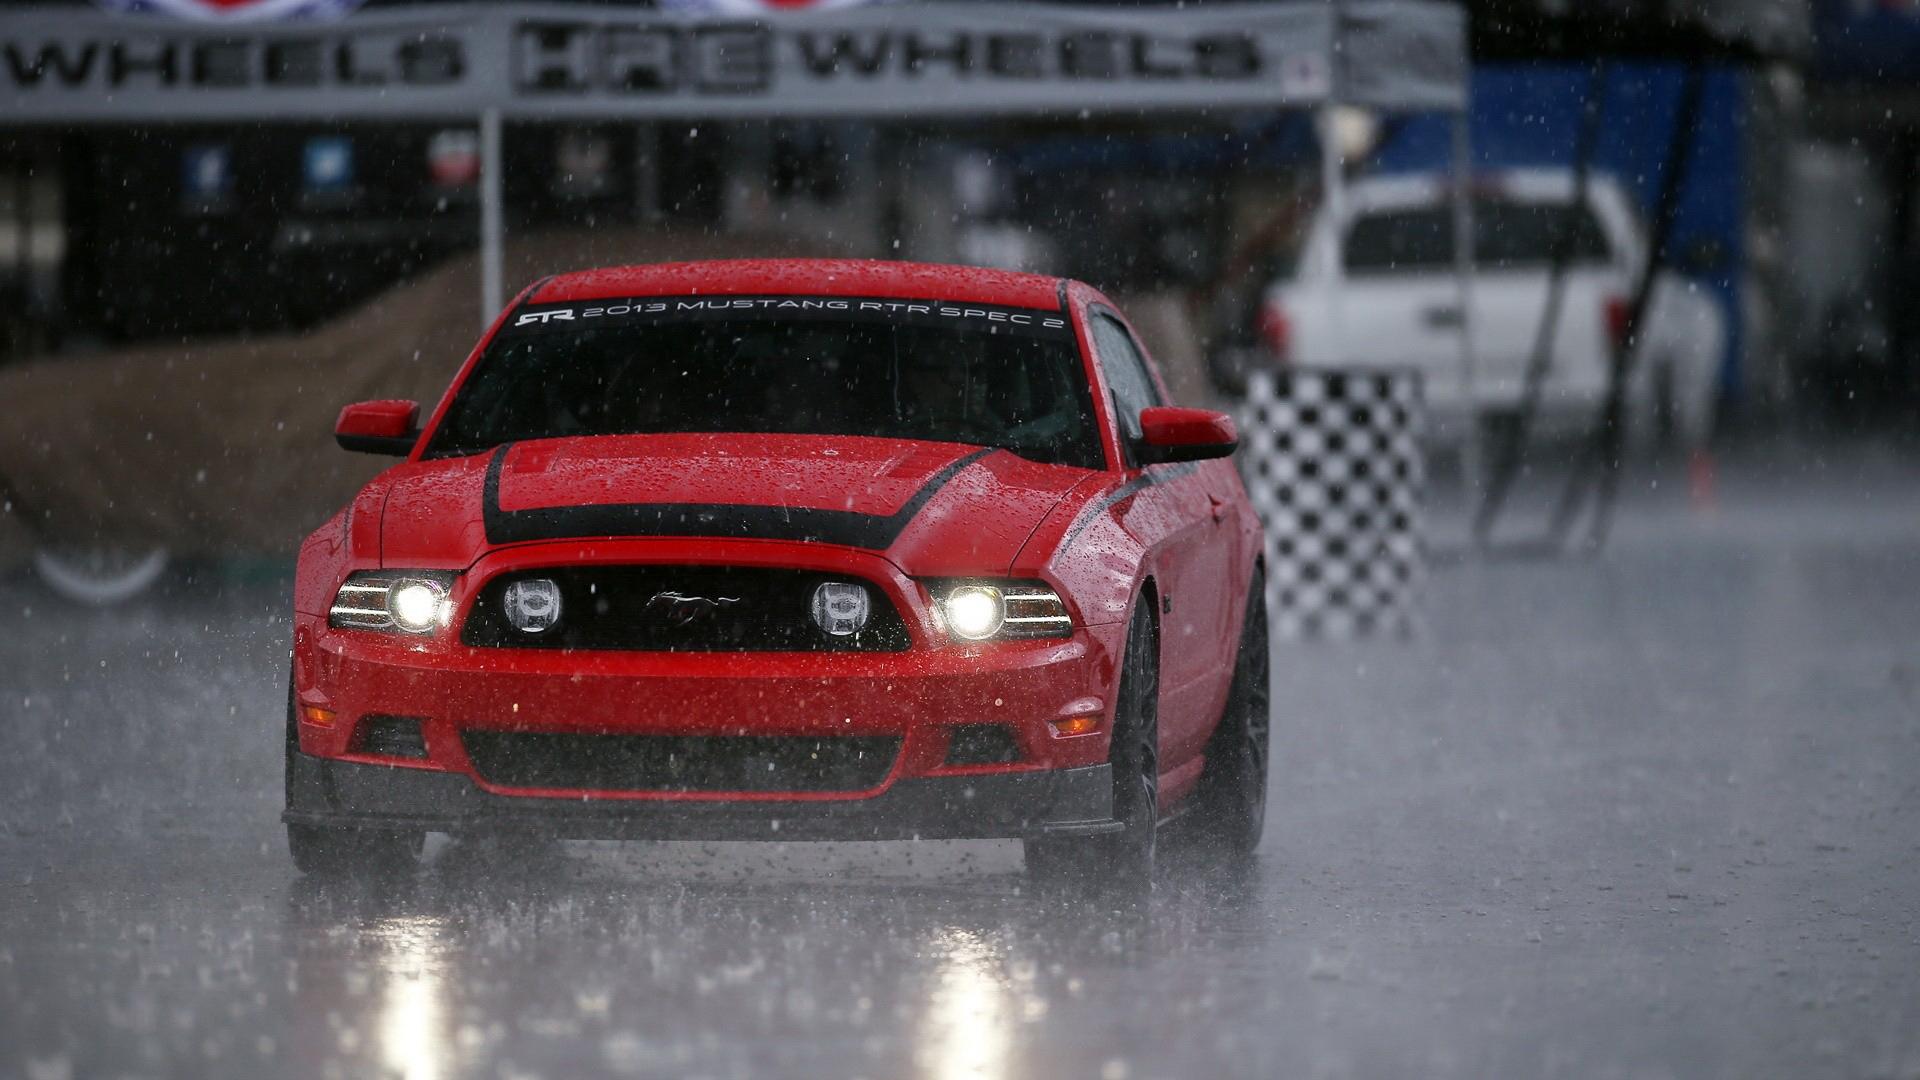 Ford Mustang гоночный красный тюнинг онлайн